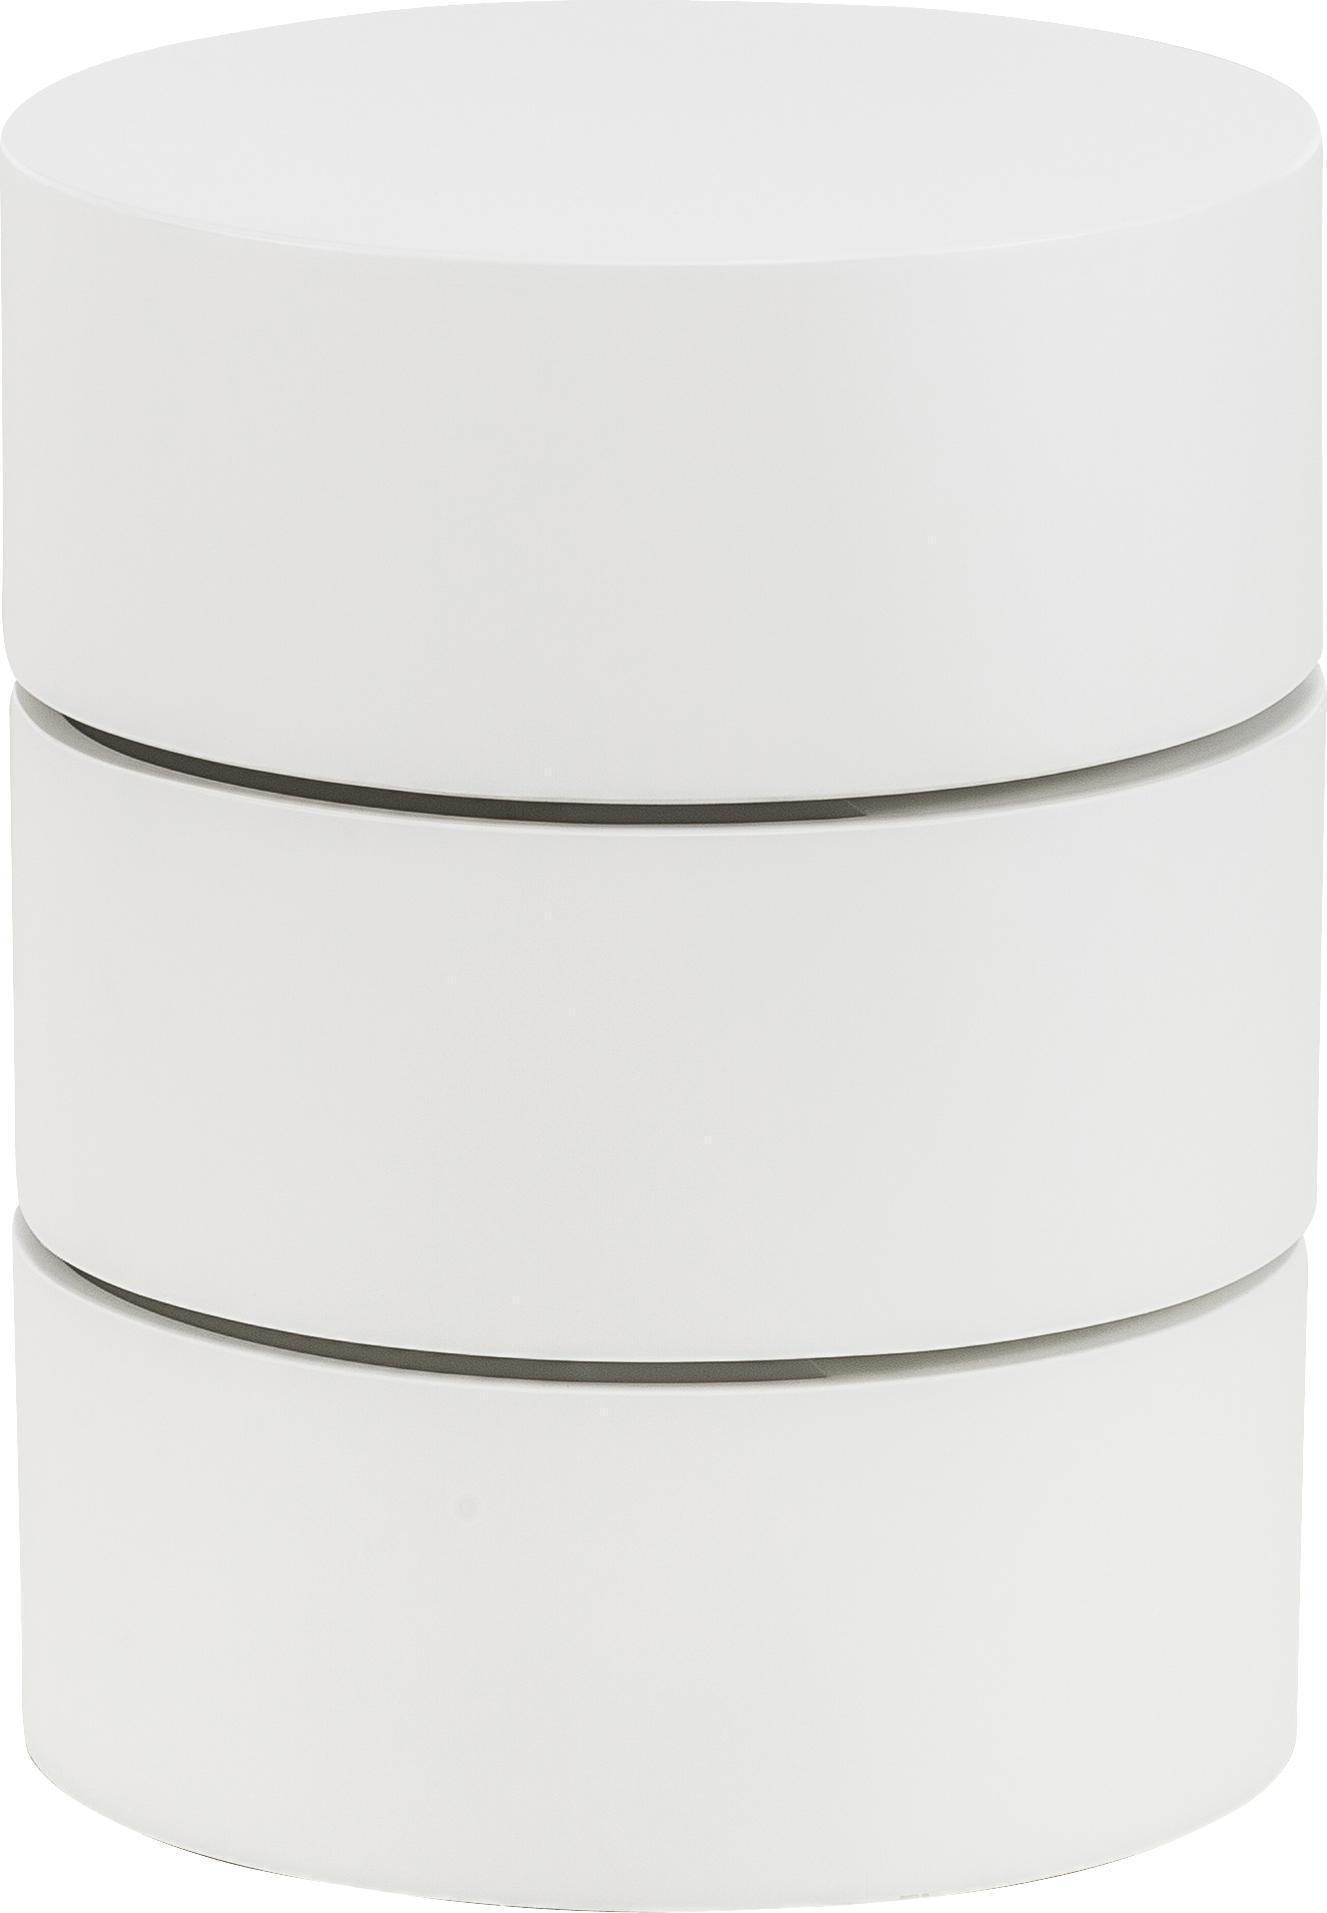 Mesa auxiliar Loka, Tablero de fibras de densidad media(MDF), pintado, Blanco, Ø 40 x Al 51 cm